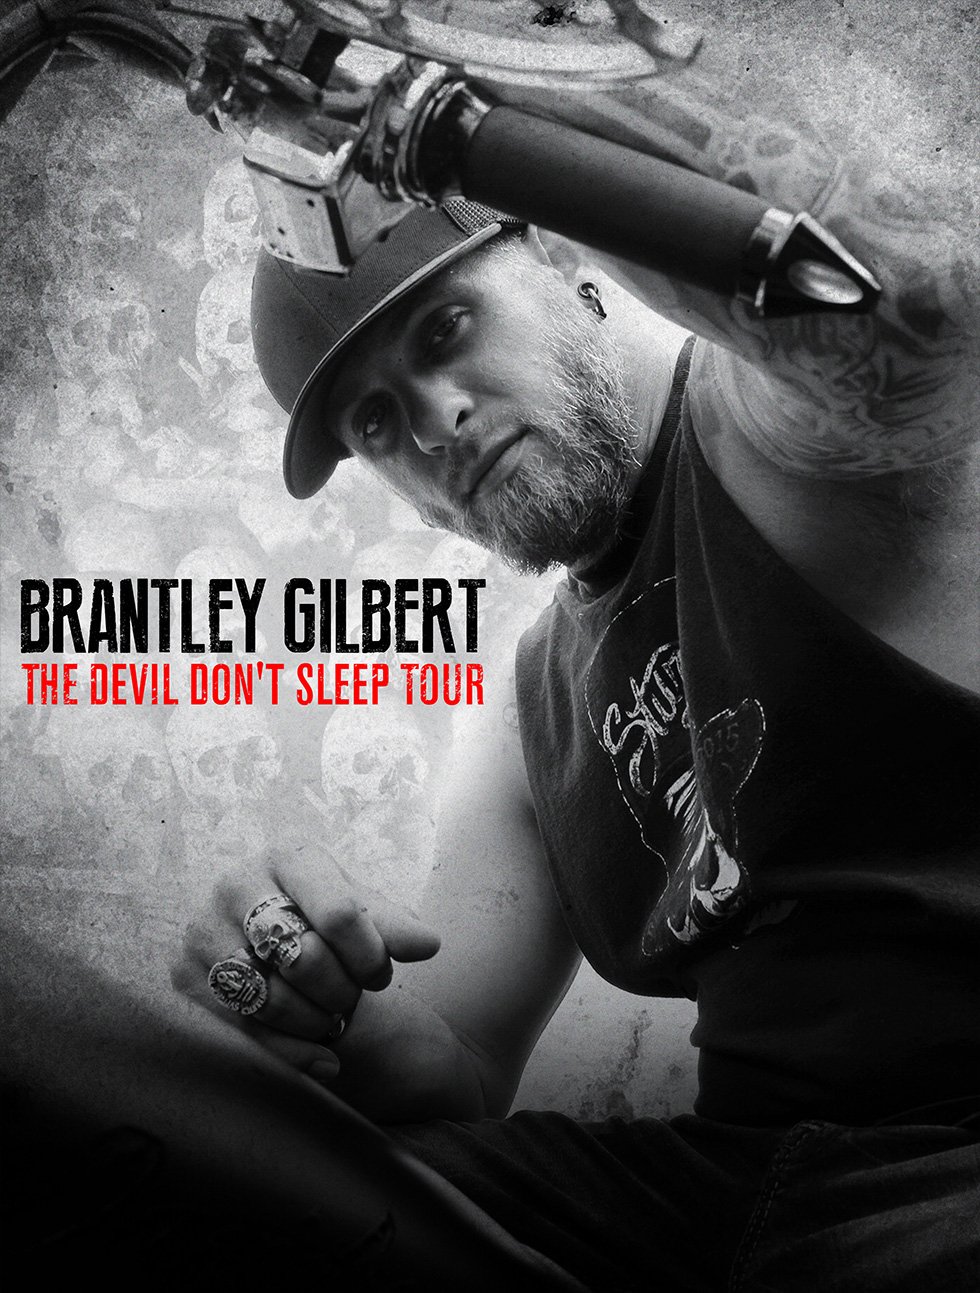 Brantley Gilbert The Devil Don't Sleep Tour 2017